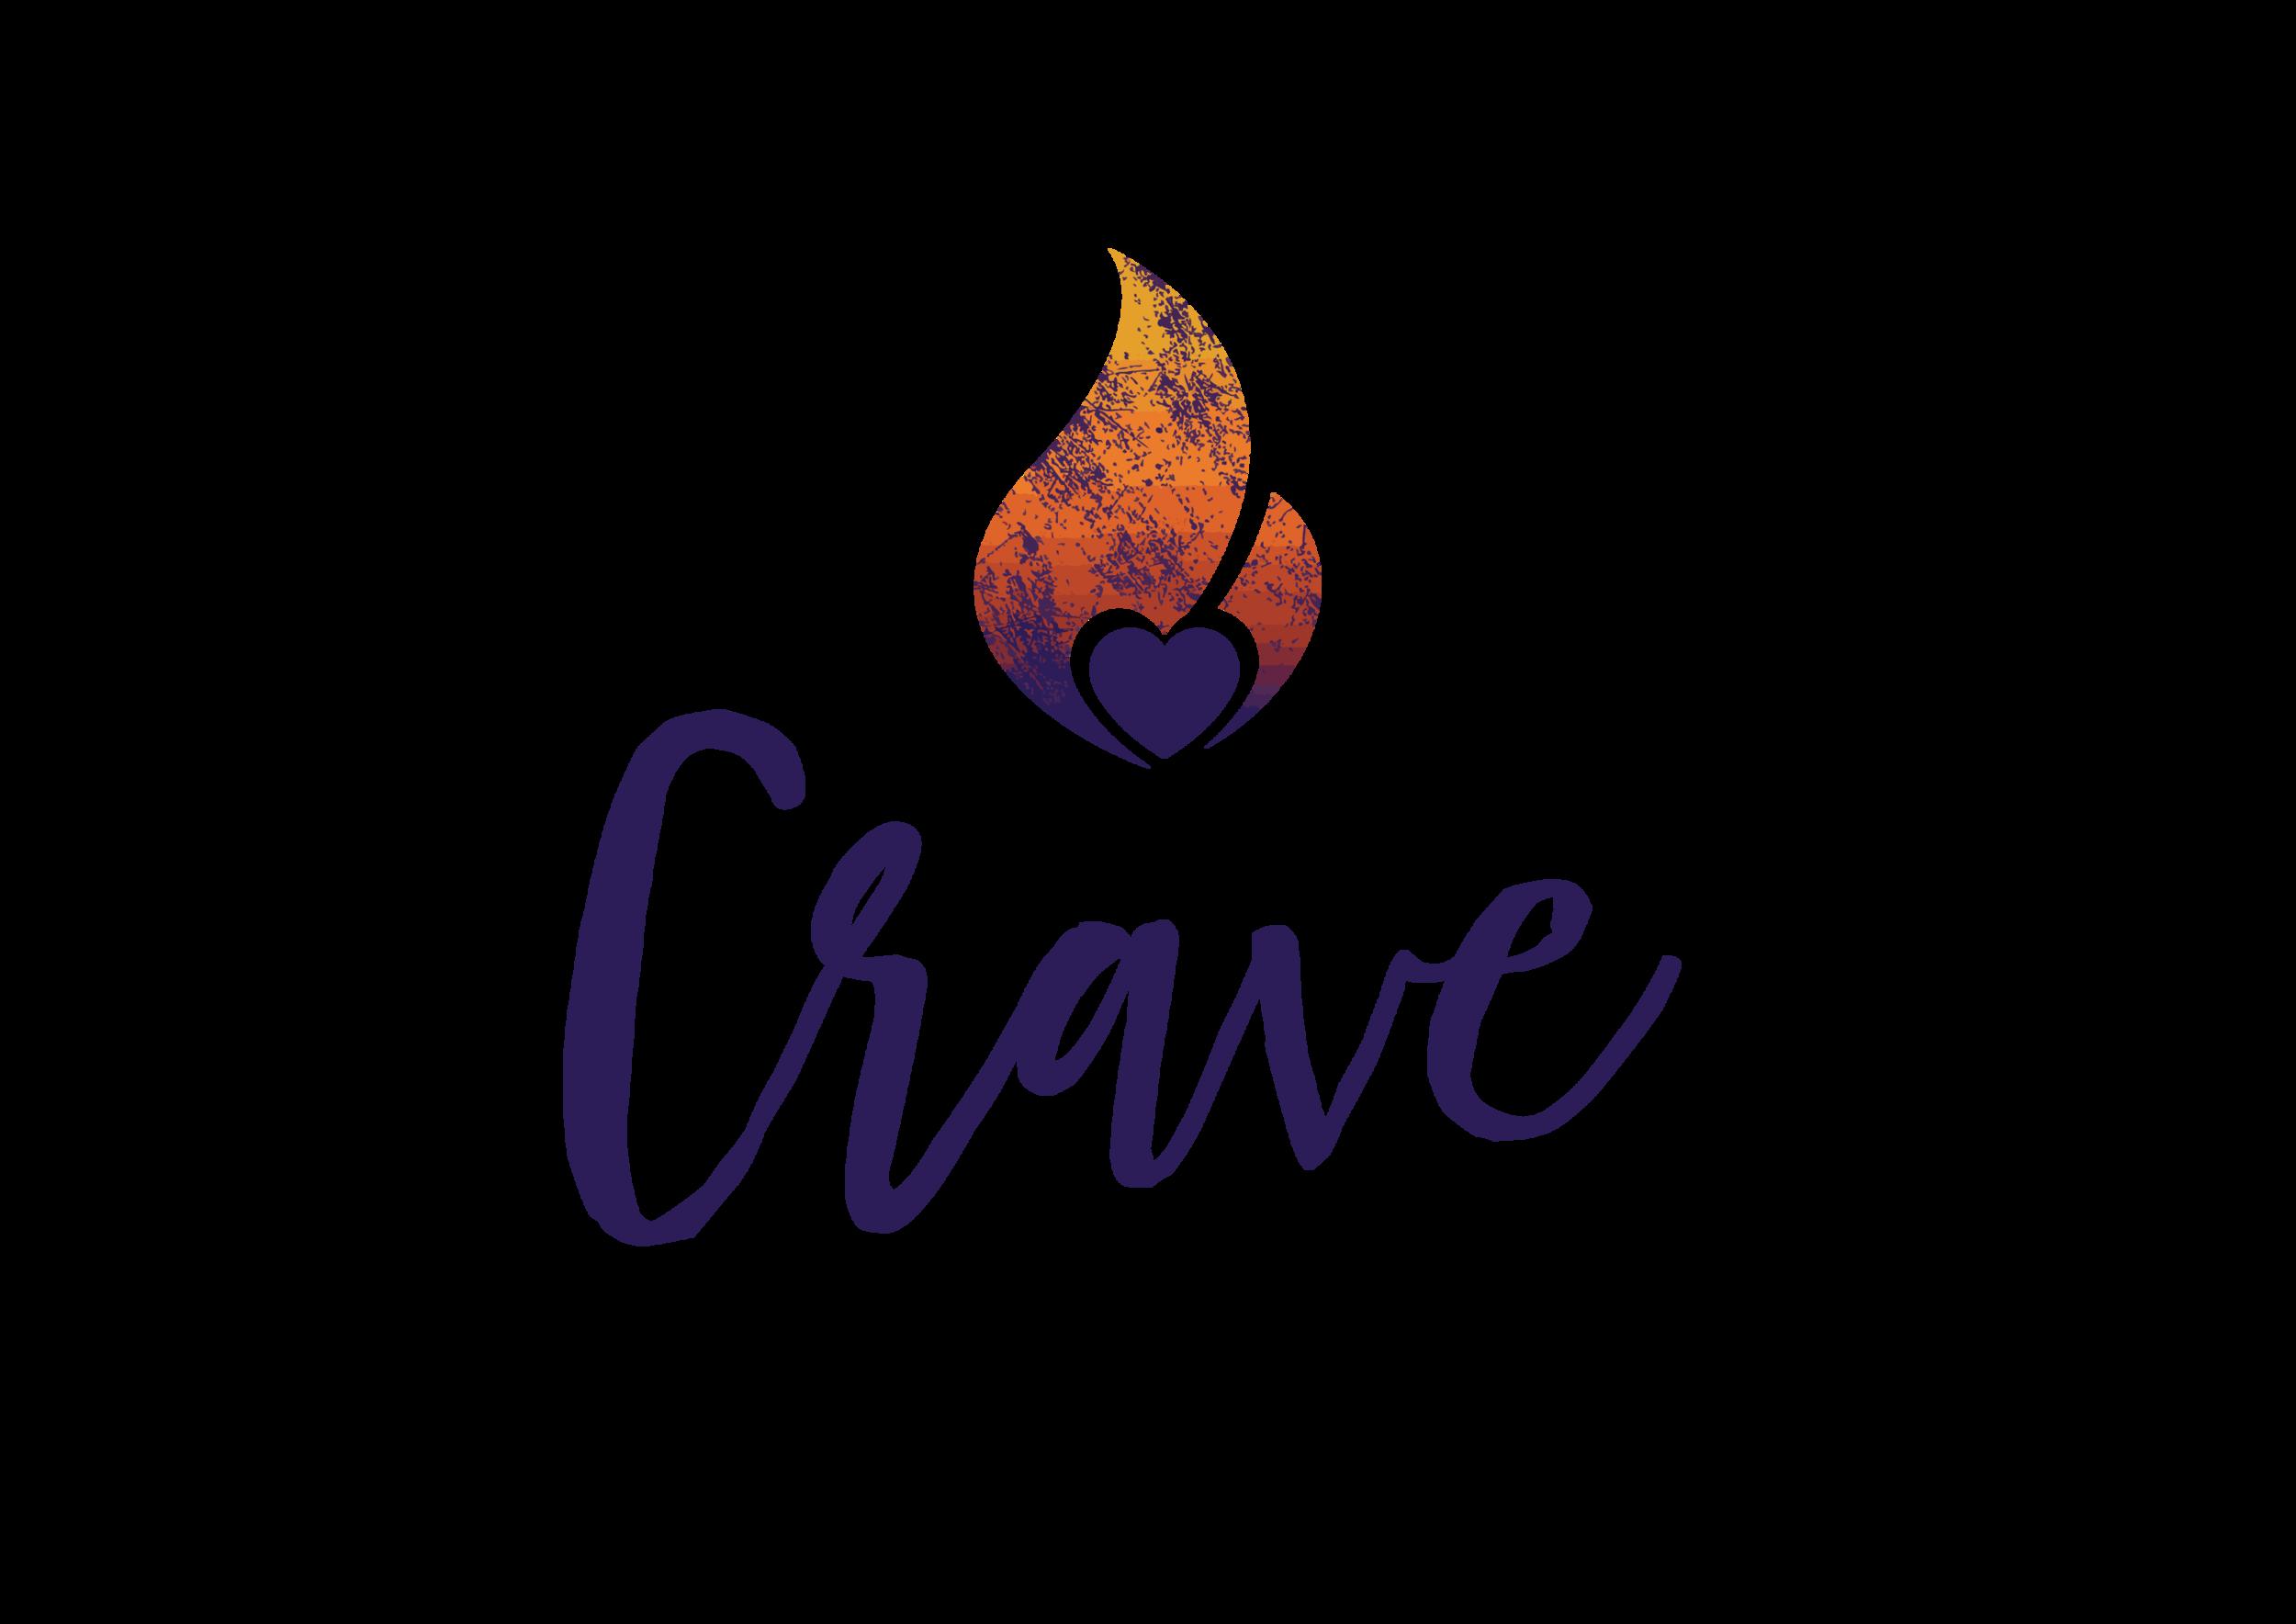 IgniteLife_Main-Crave.png